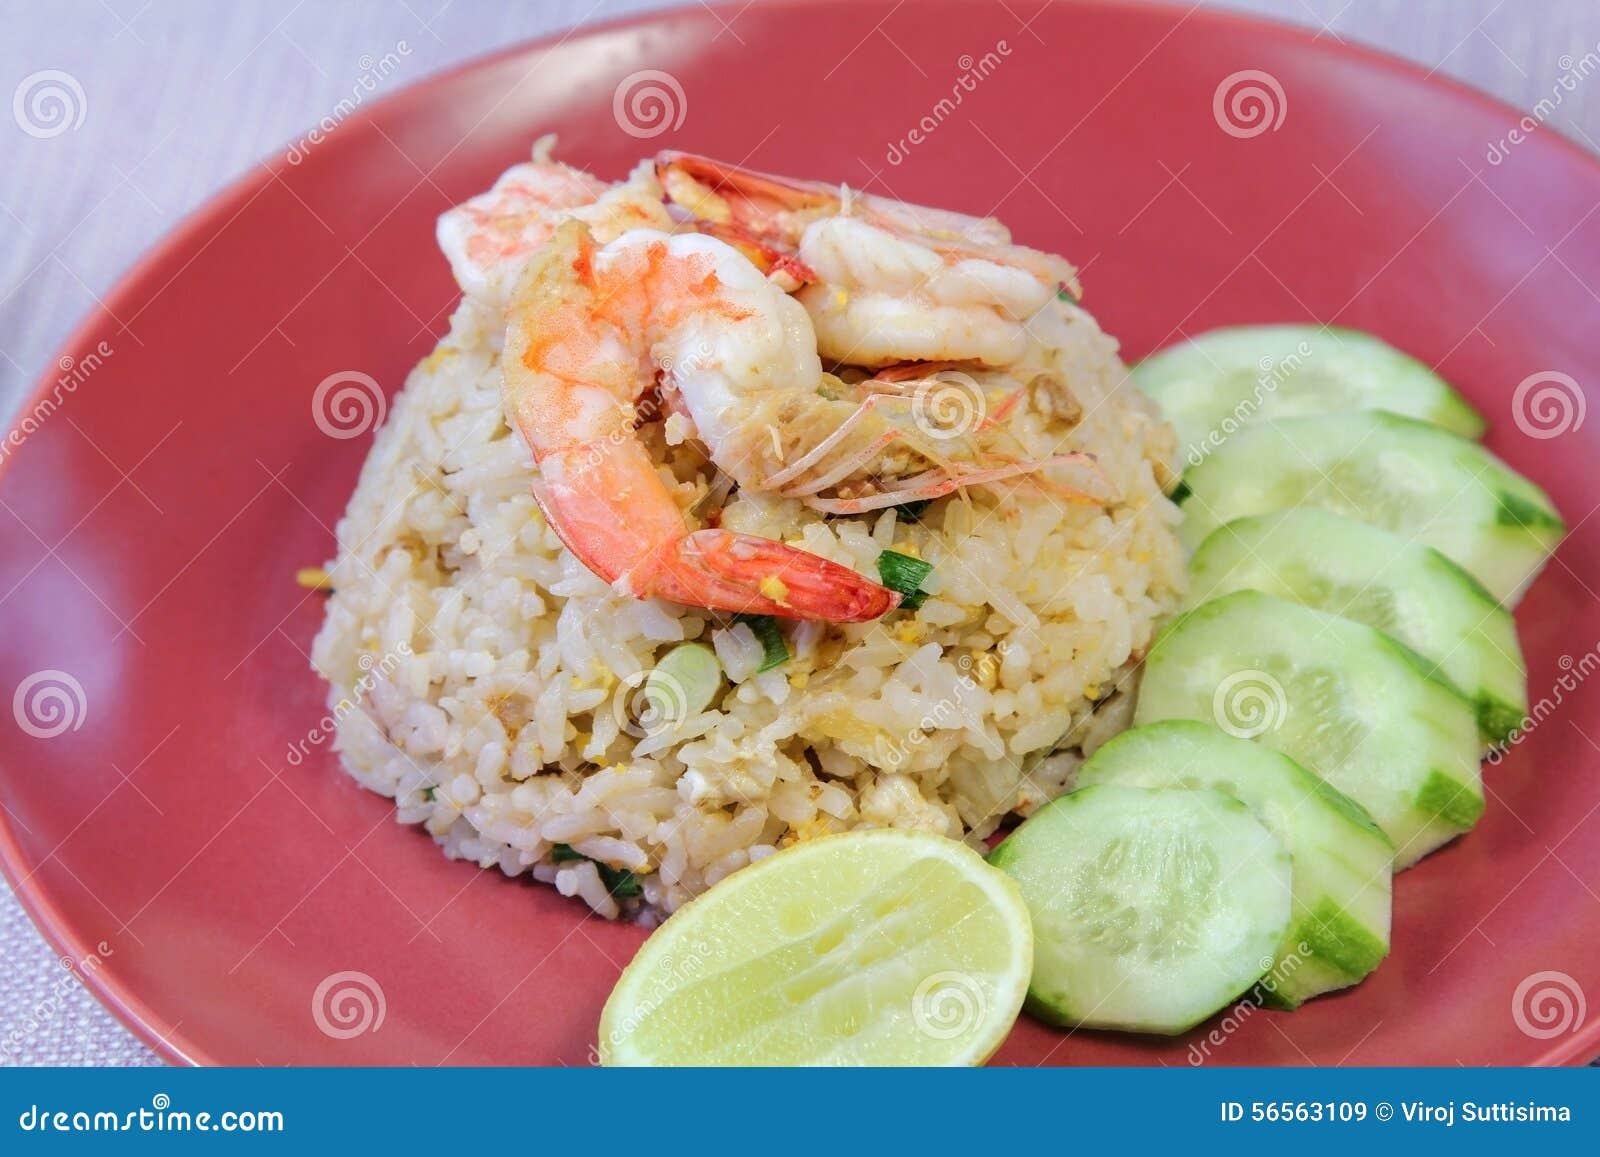 Download Τηγανισμένο γαρίδες ρύζι, τρόφιμα Στοκ Εικόνα - εικόνα από backgrounder, καλλιέργεια: 56563109